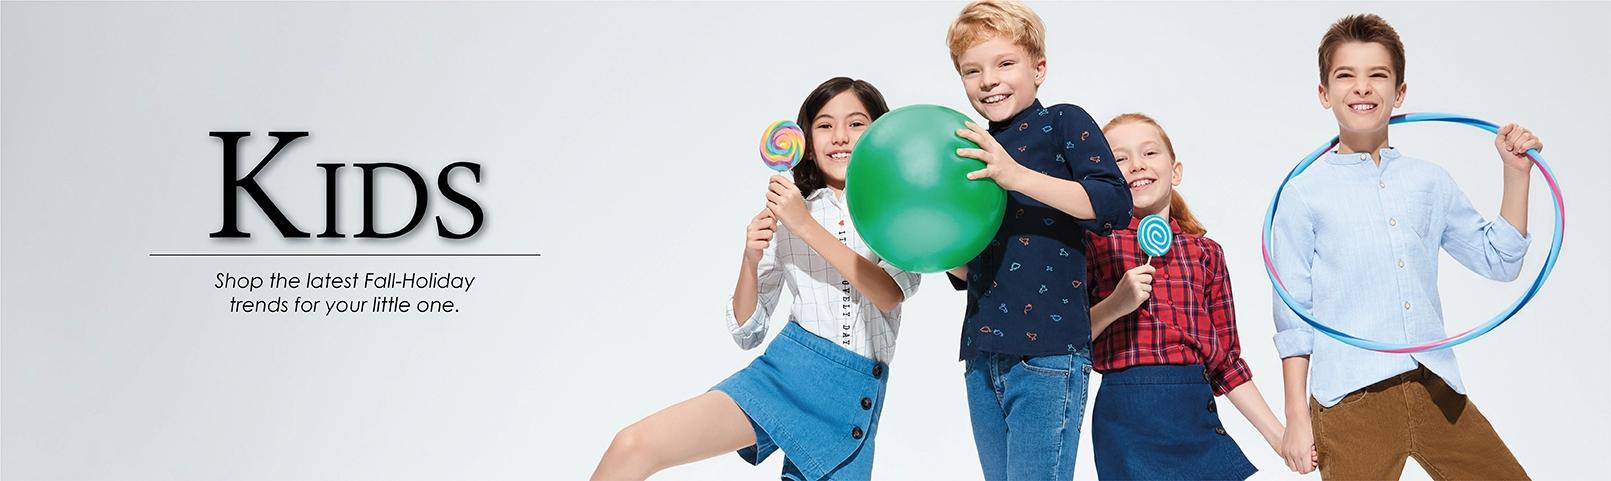 Kids - Miki